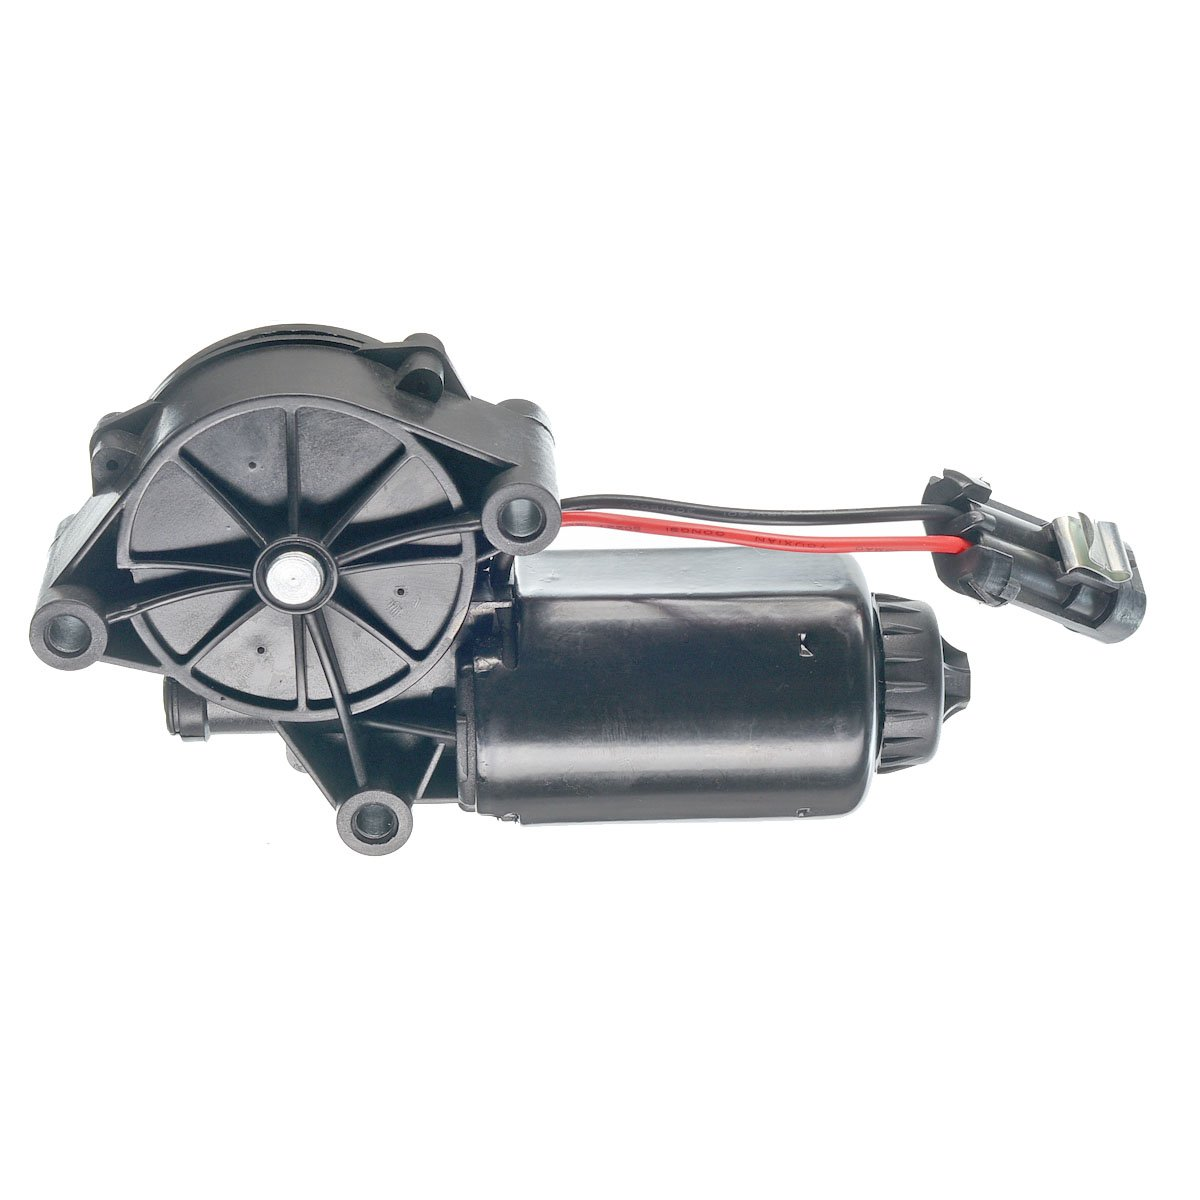 A-Premium Headlight Headlamp Motor for Pontiac Firebird 1993-1997 Front/Left/Driver/Side